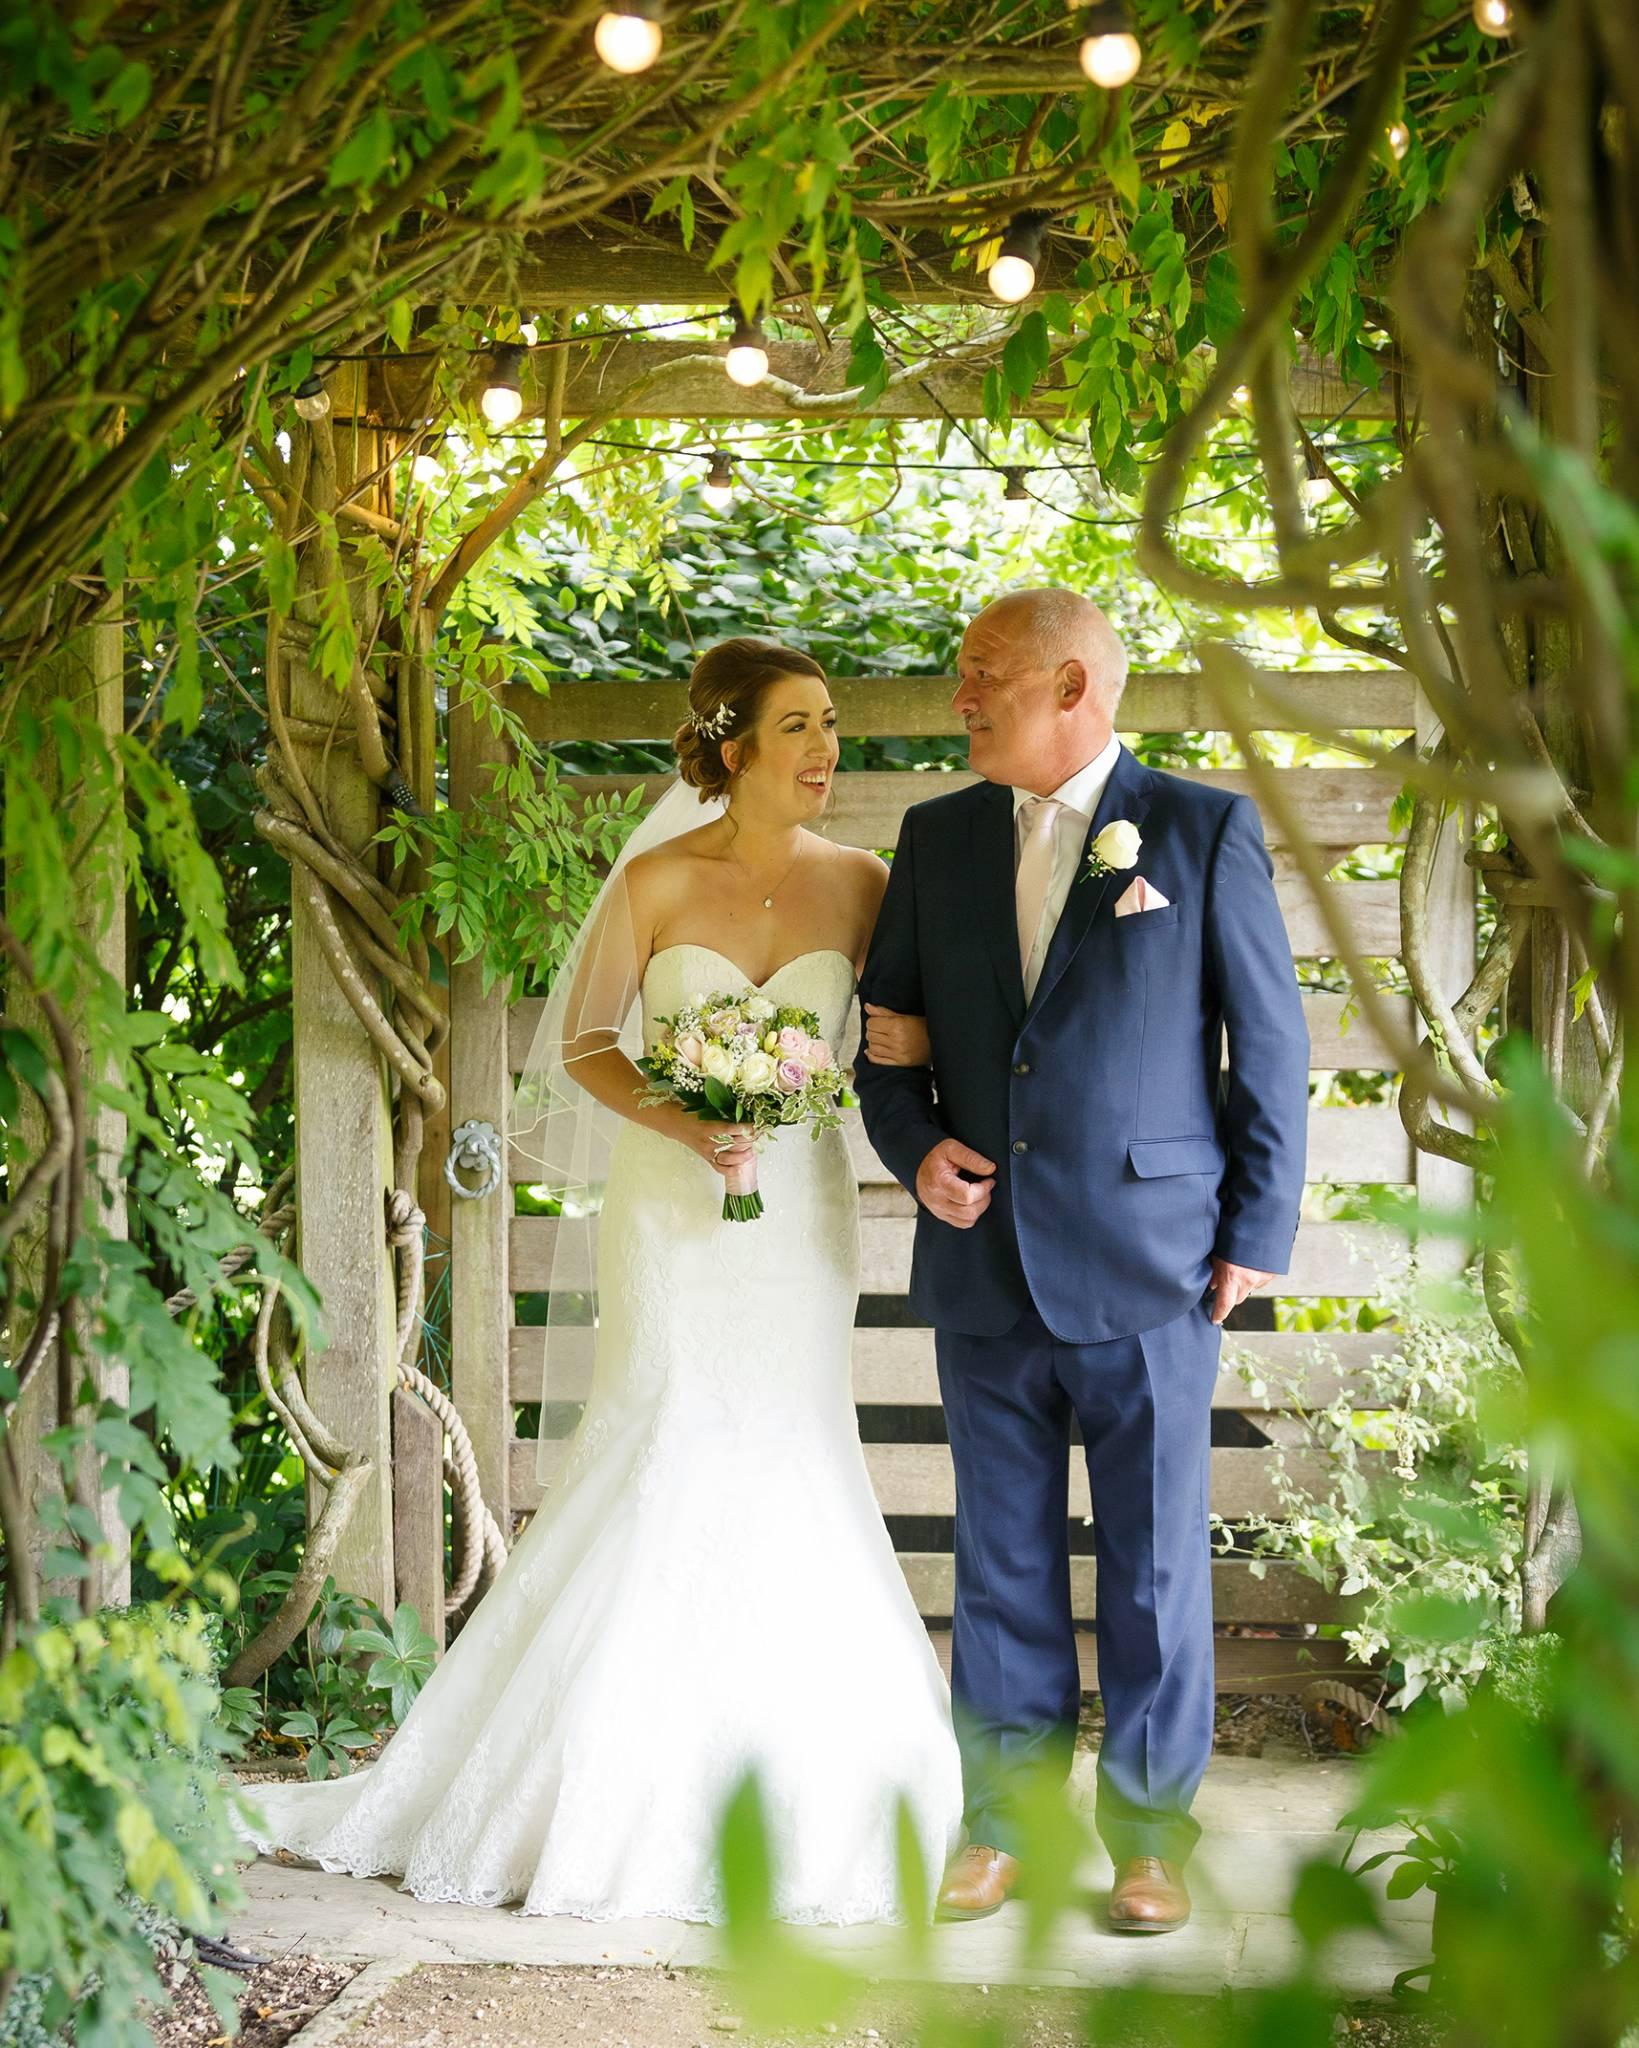 wedding photographer, wedding photographer, The Tythe Barn, Launtonhigh wycombe, buckinghamshire, bucks,